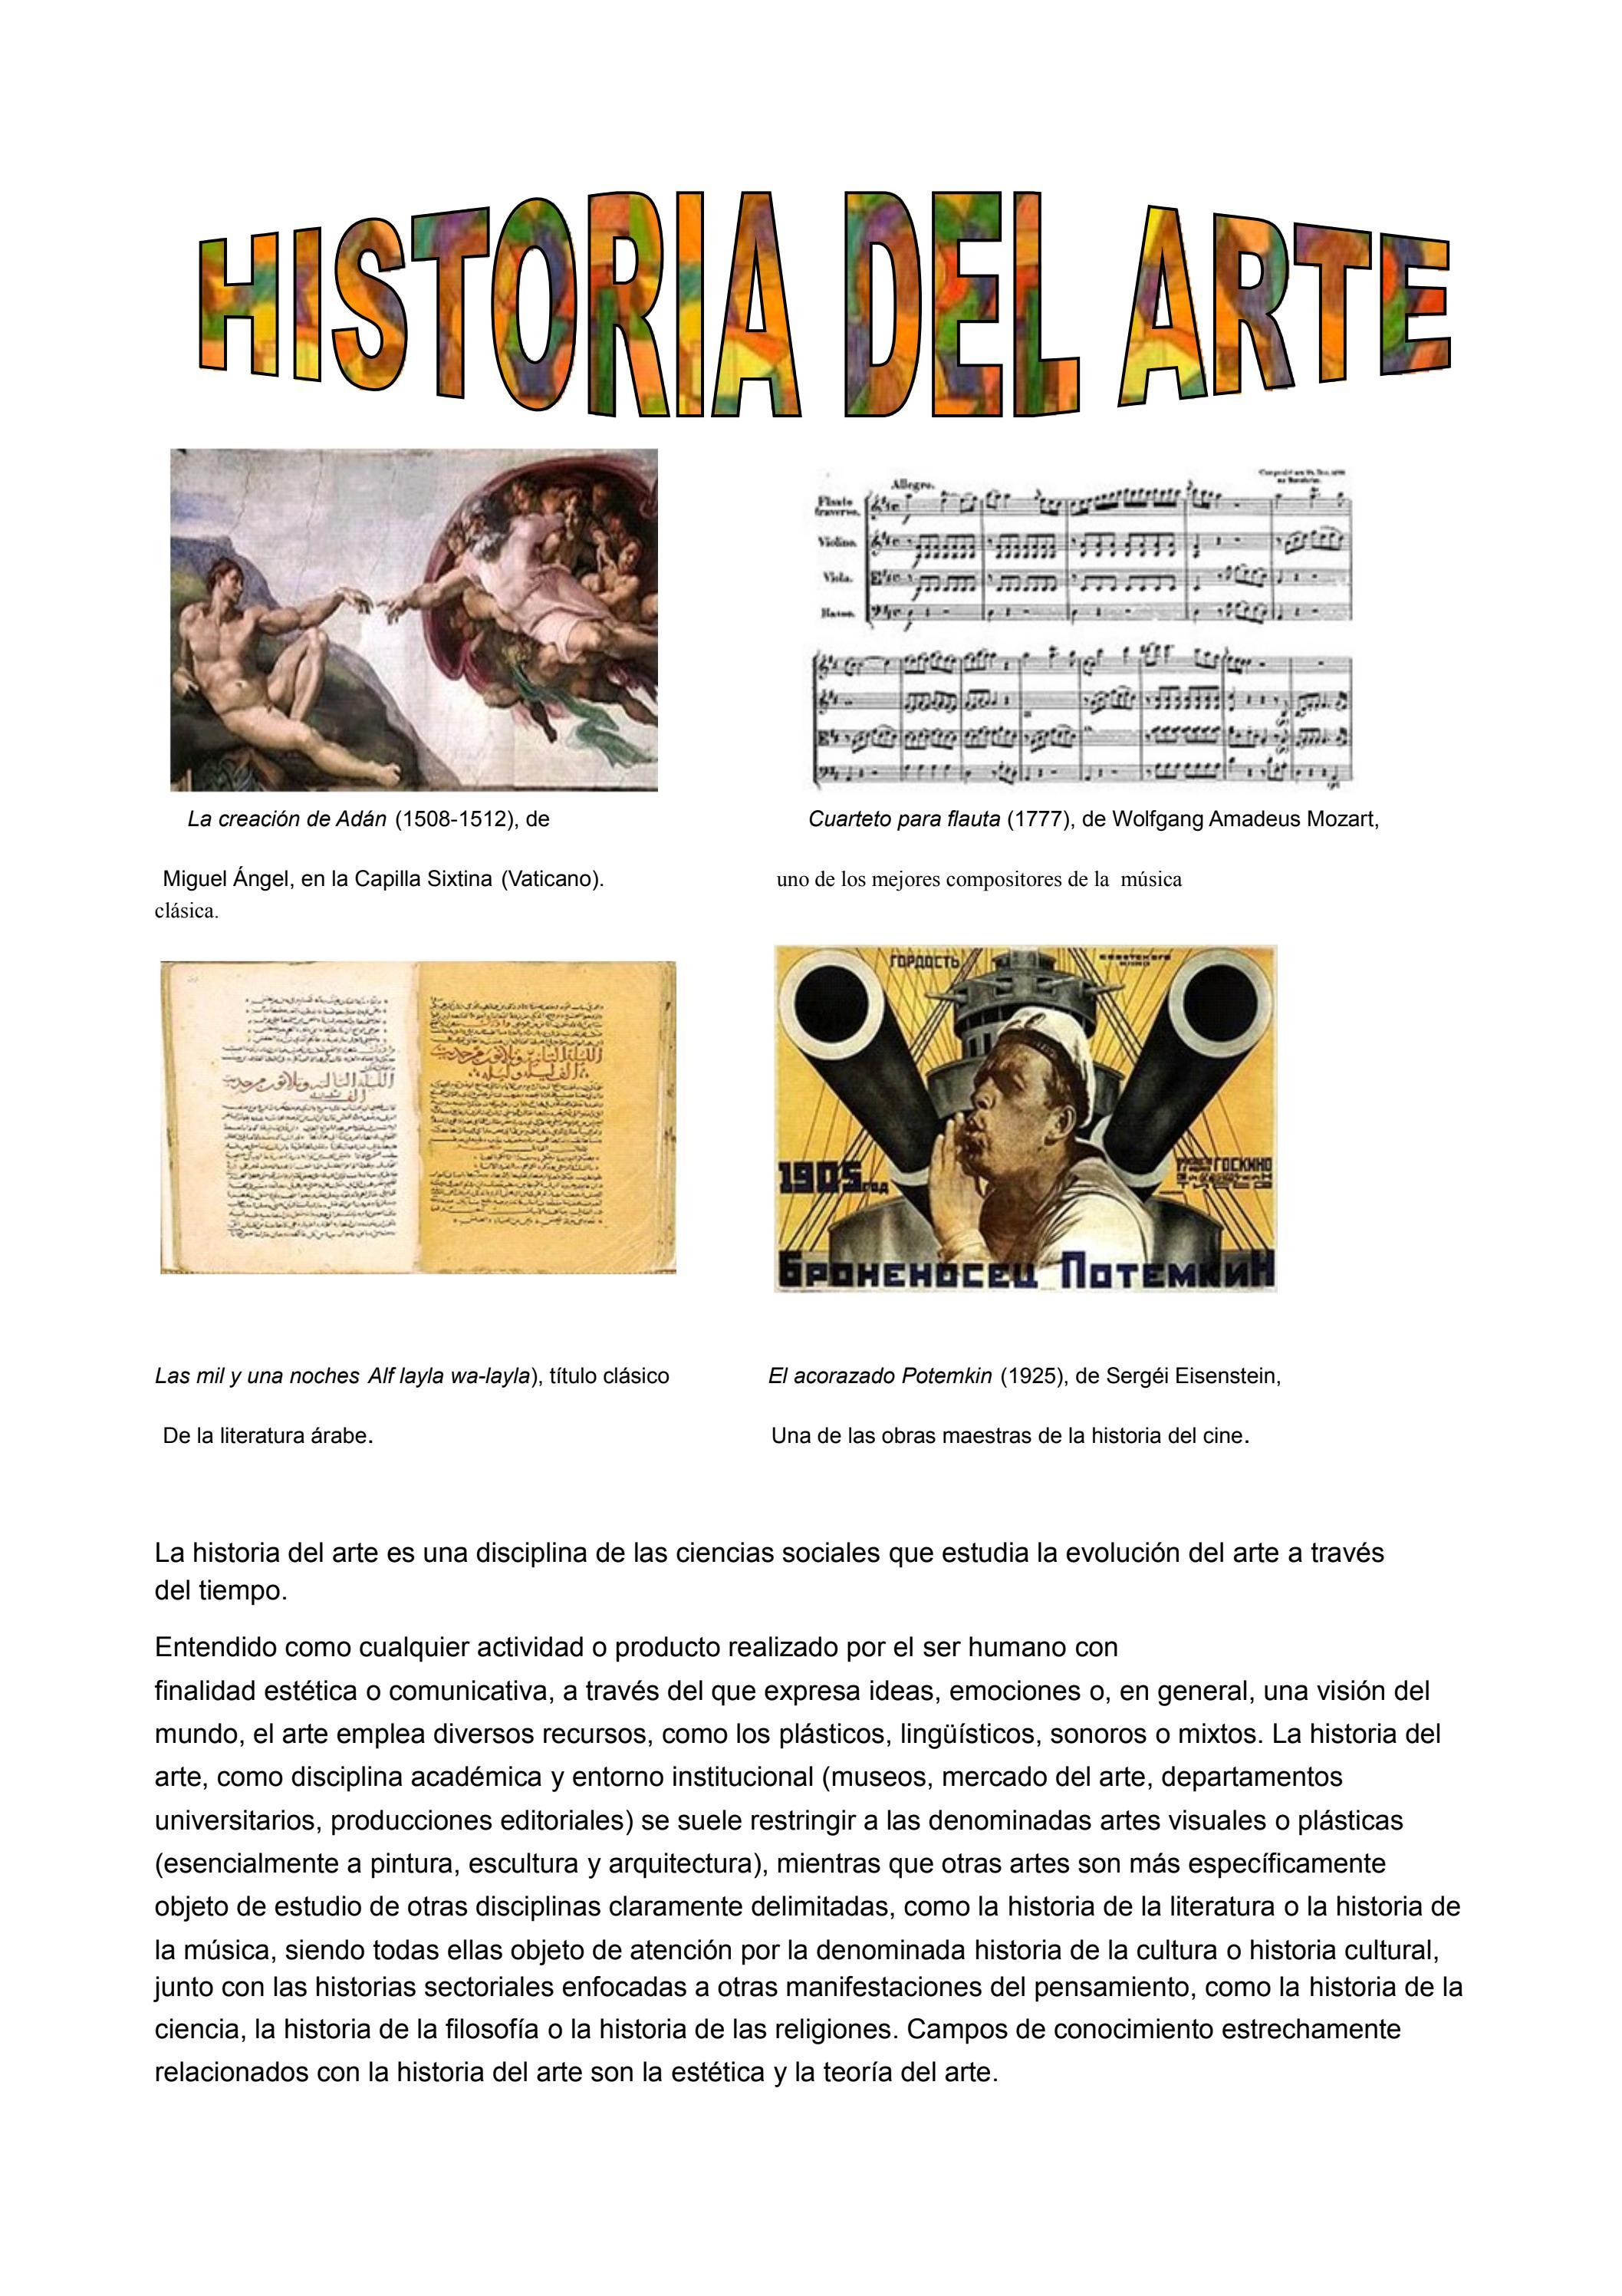 Historia del arte by Velásquez Maria - issuu